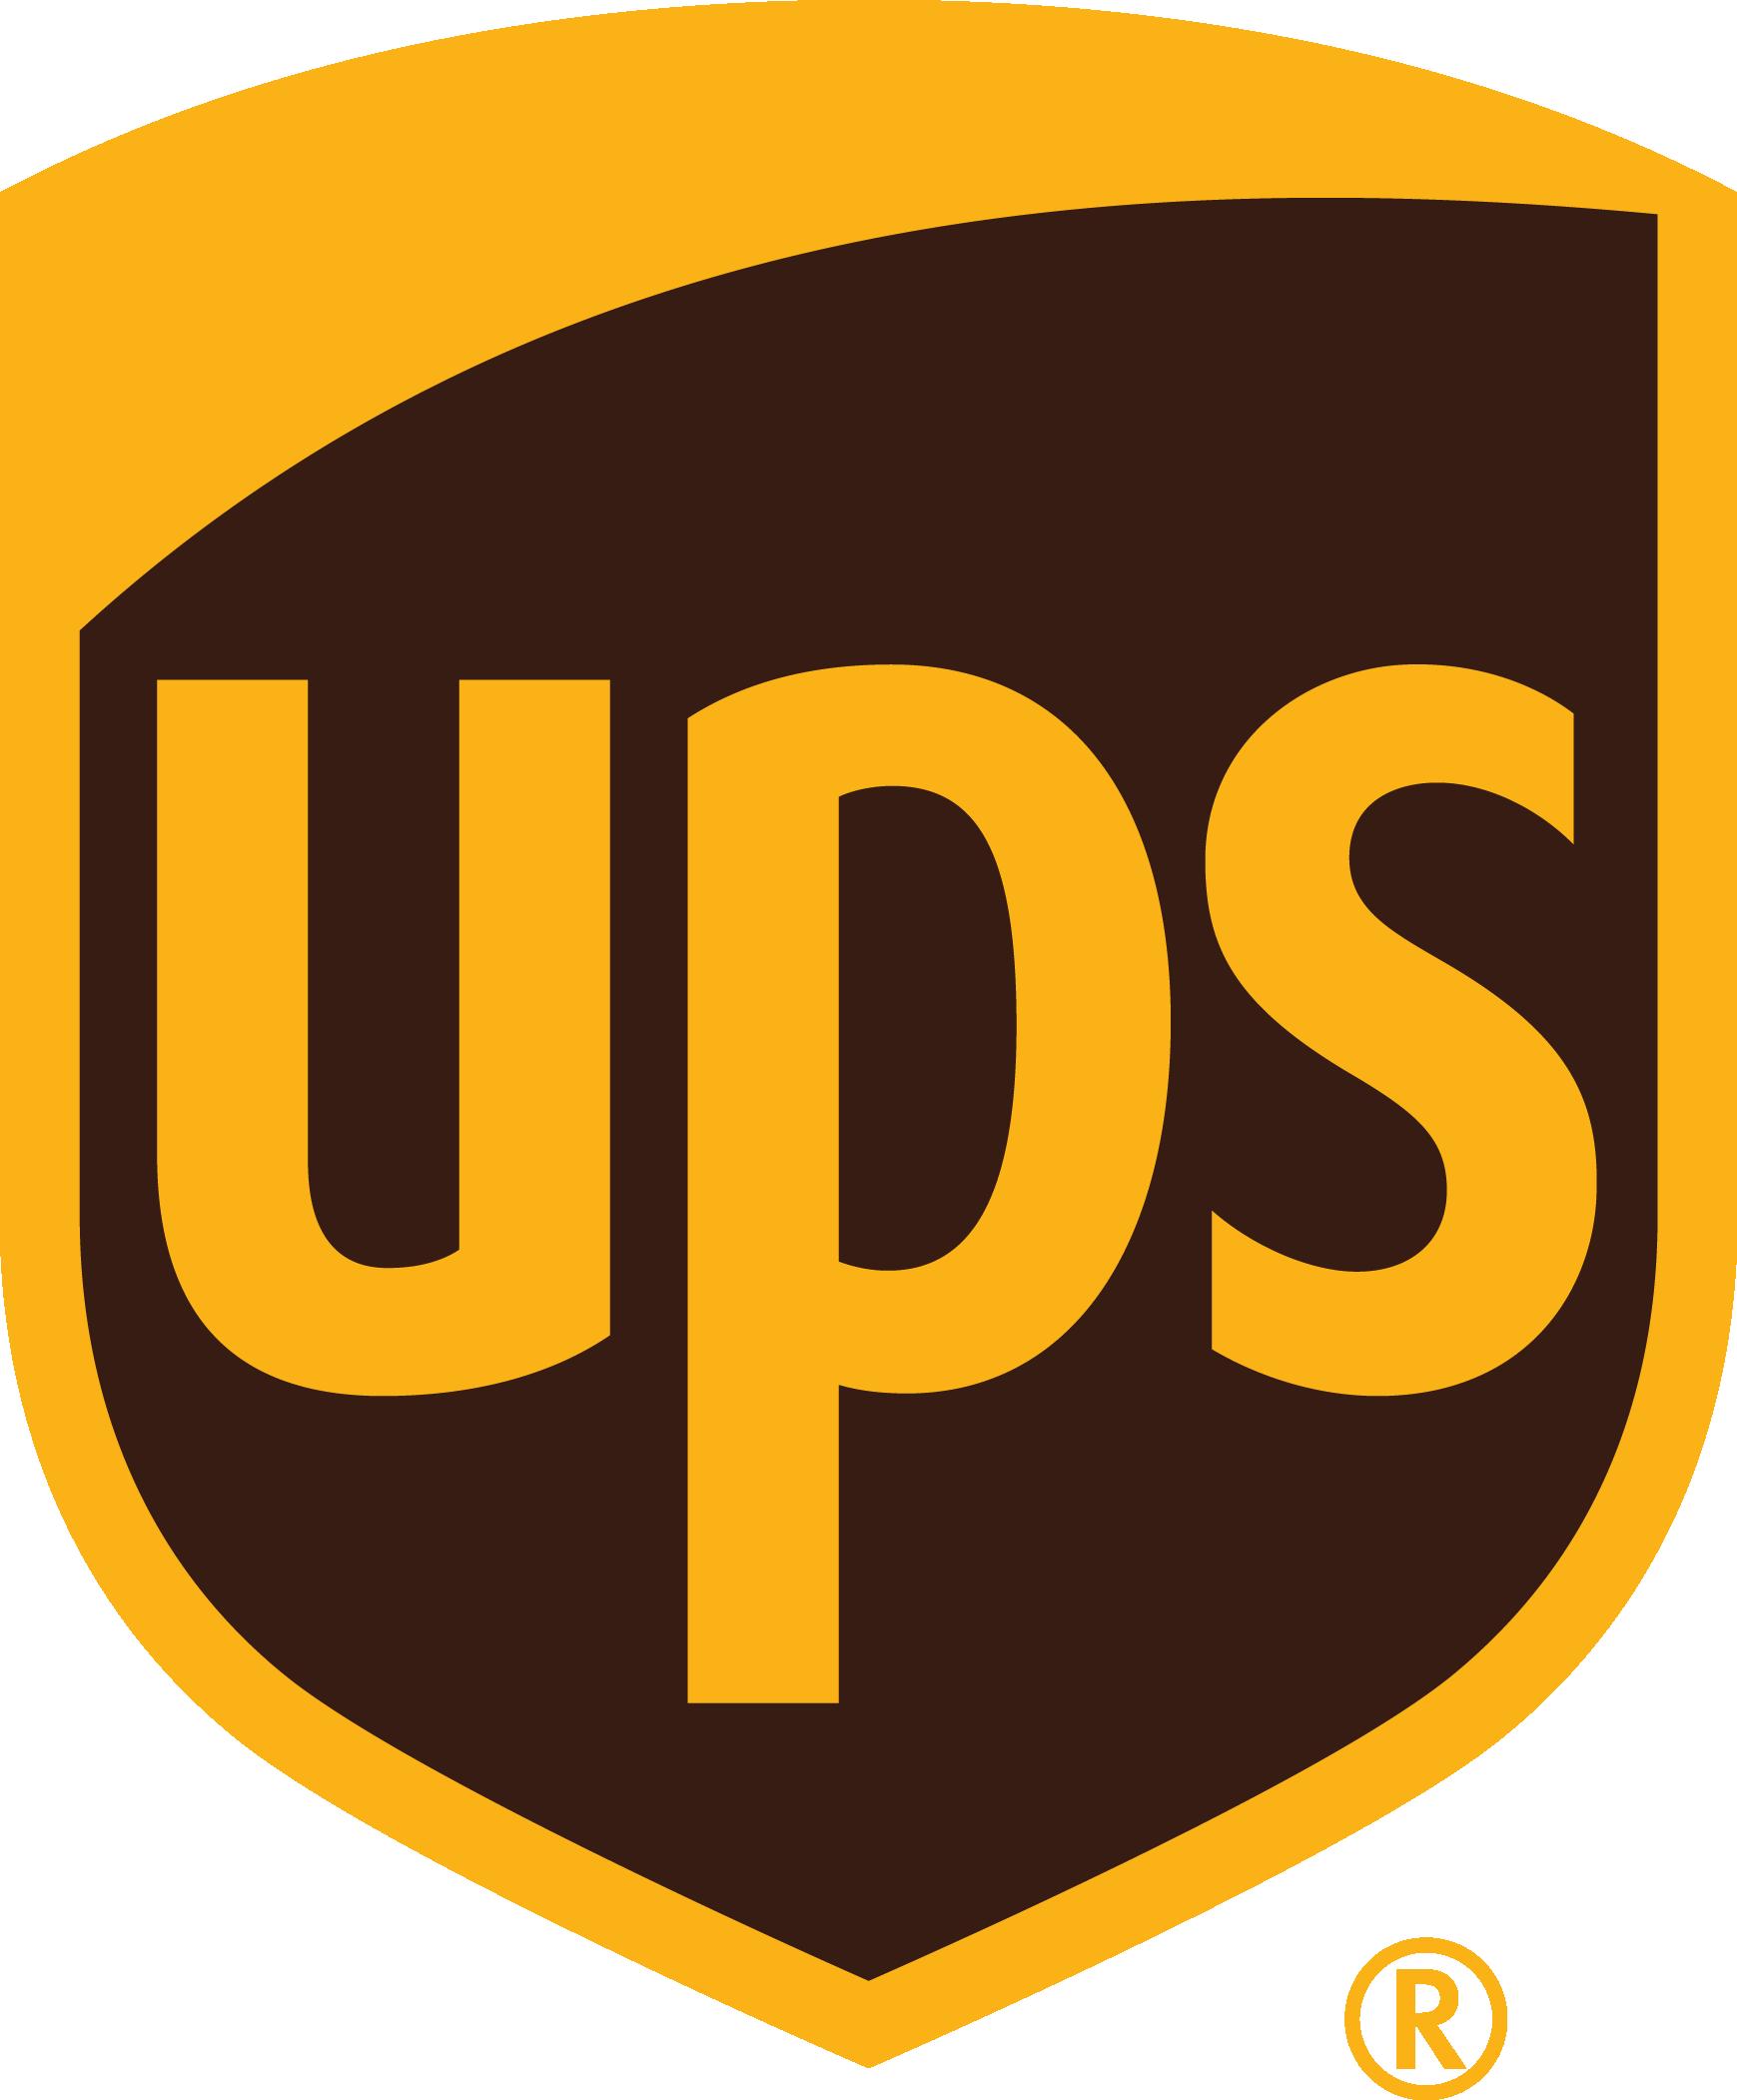 1739x2102 United Parcel Service Png Transparent United Parcel Service.png